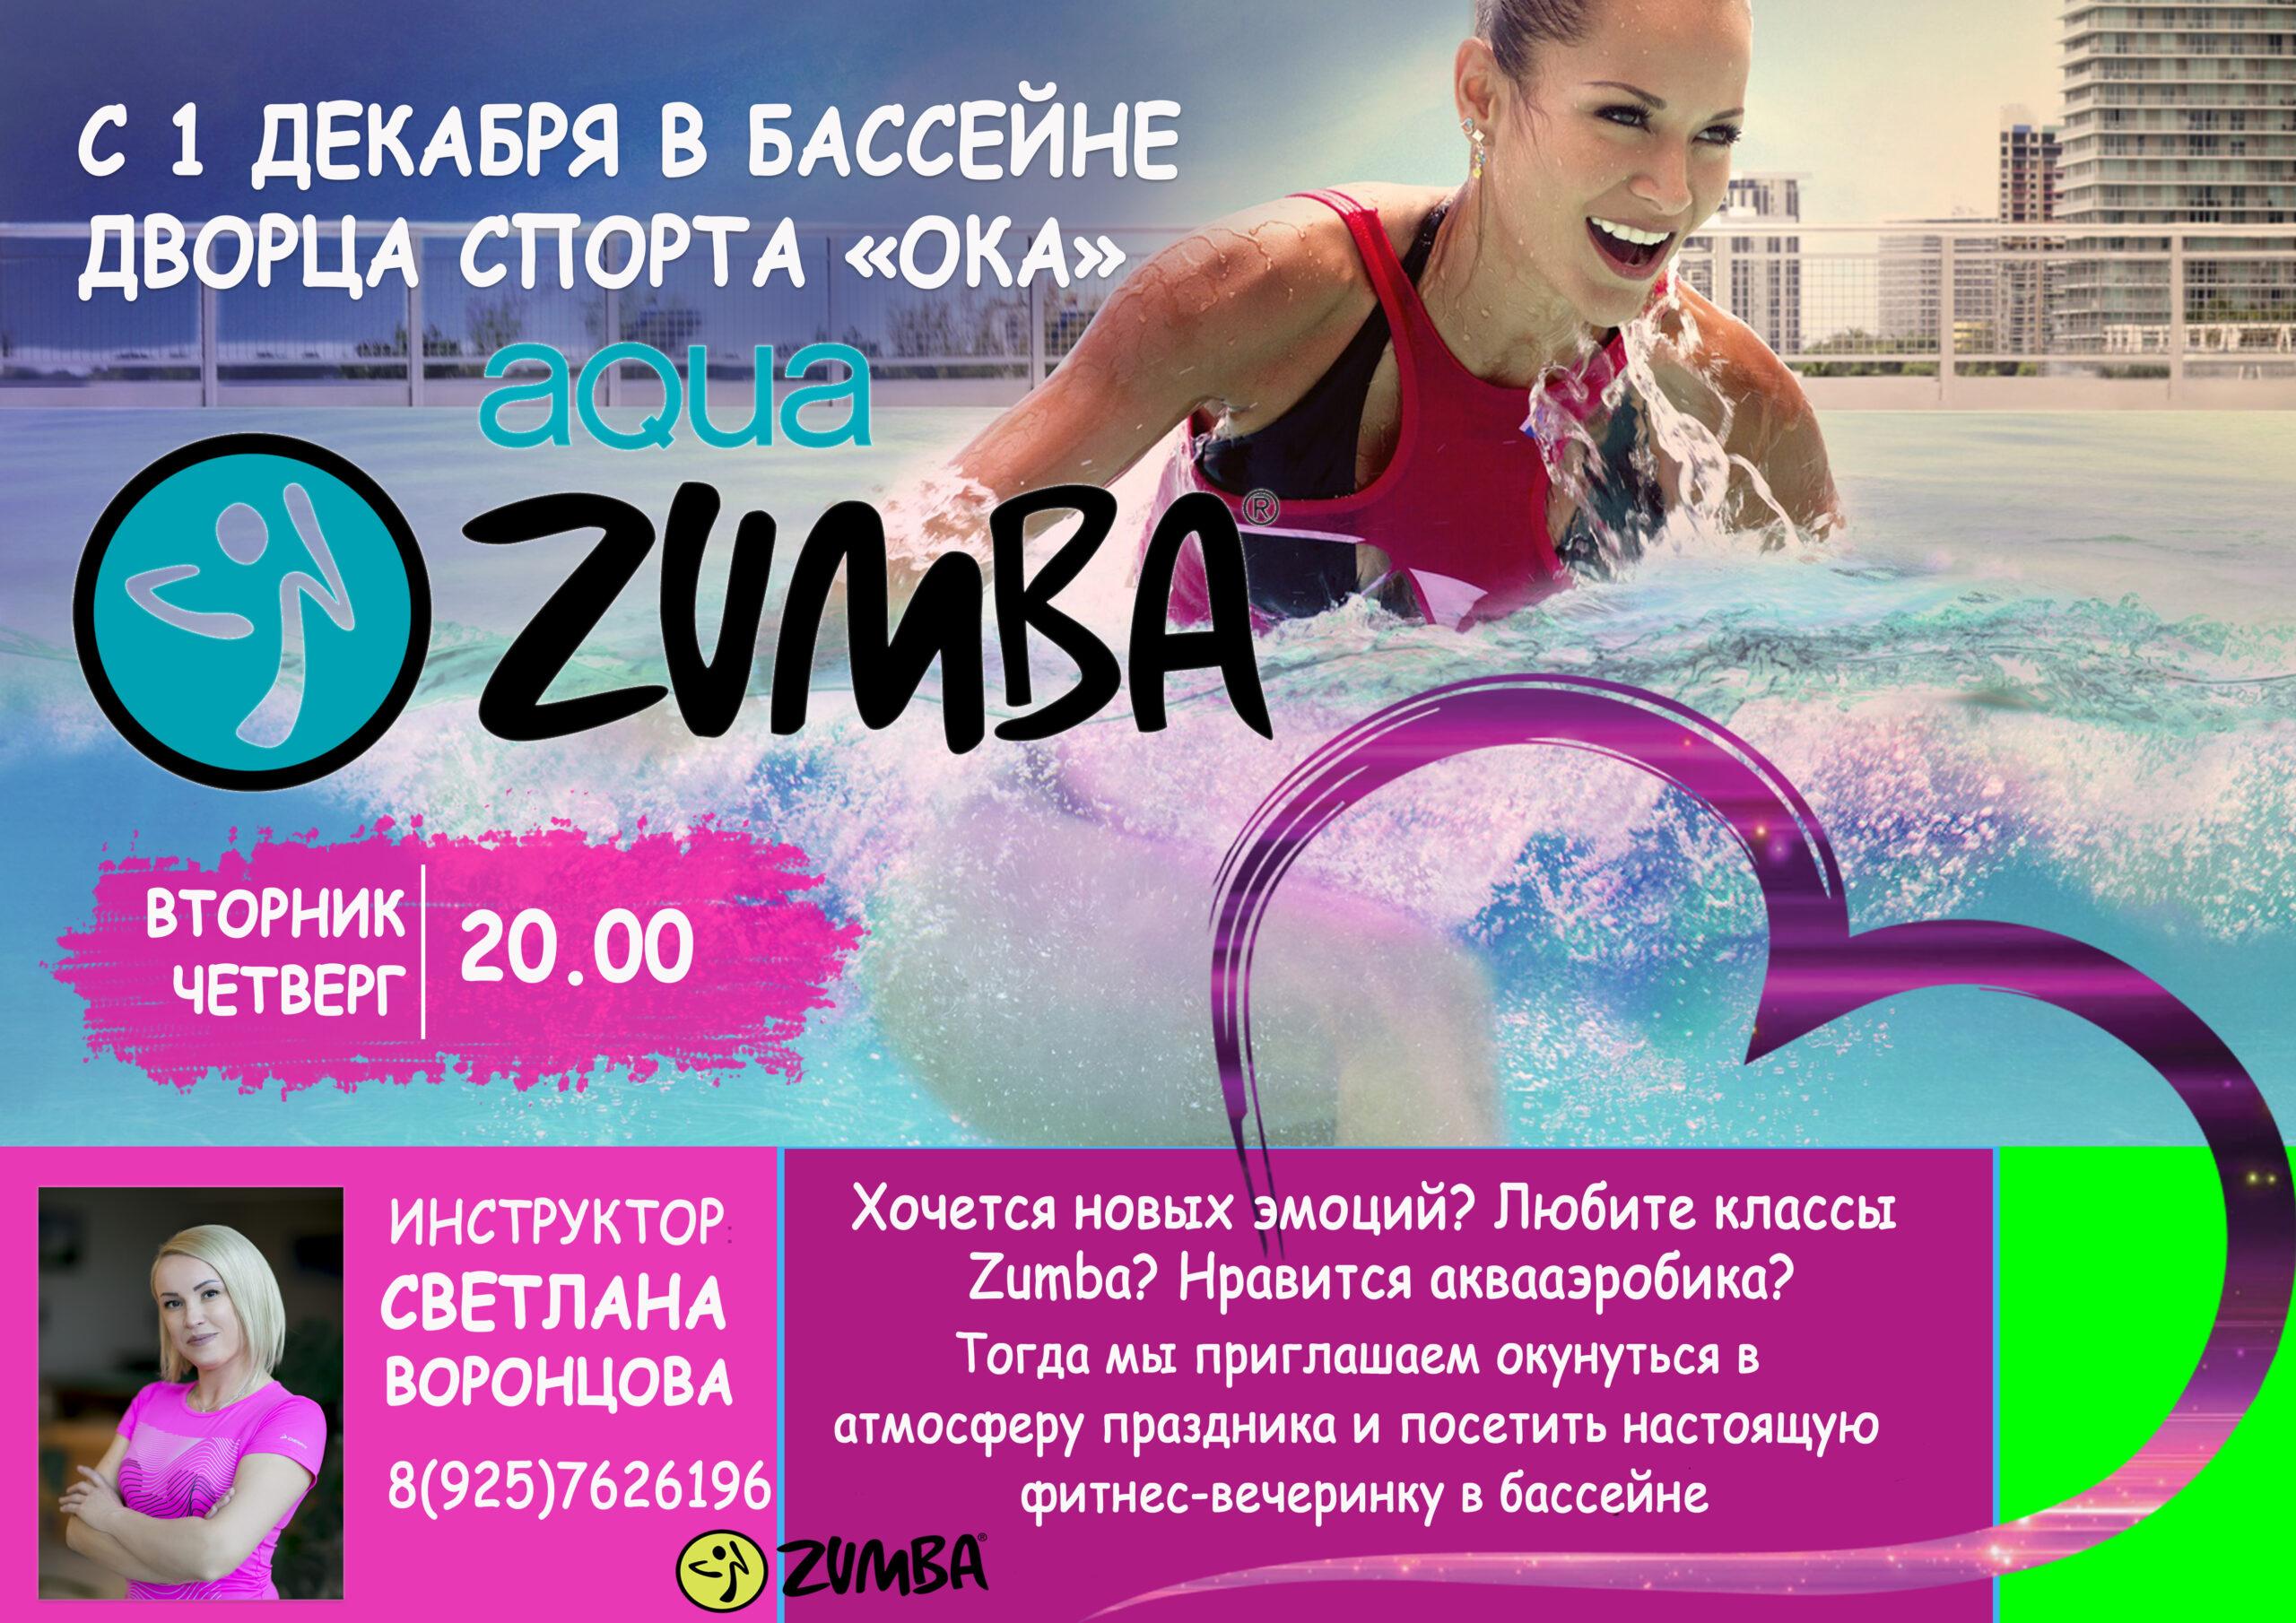 С 1 декабря стартует ZUMBA aqua dance